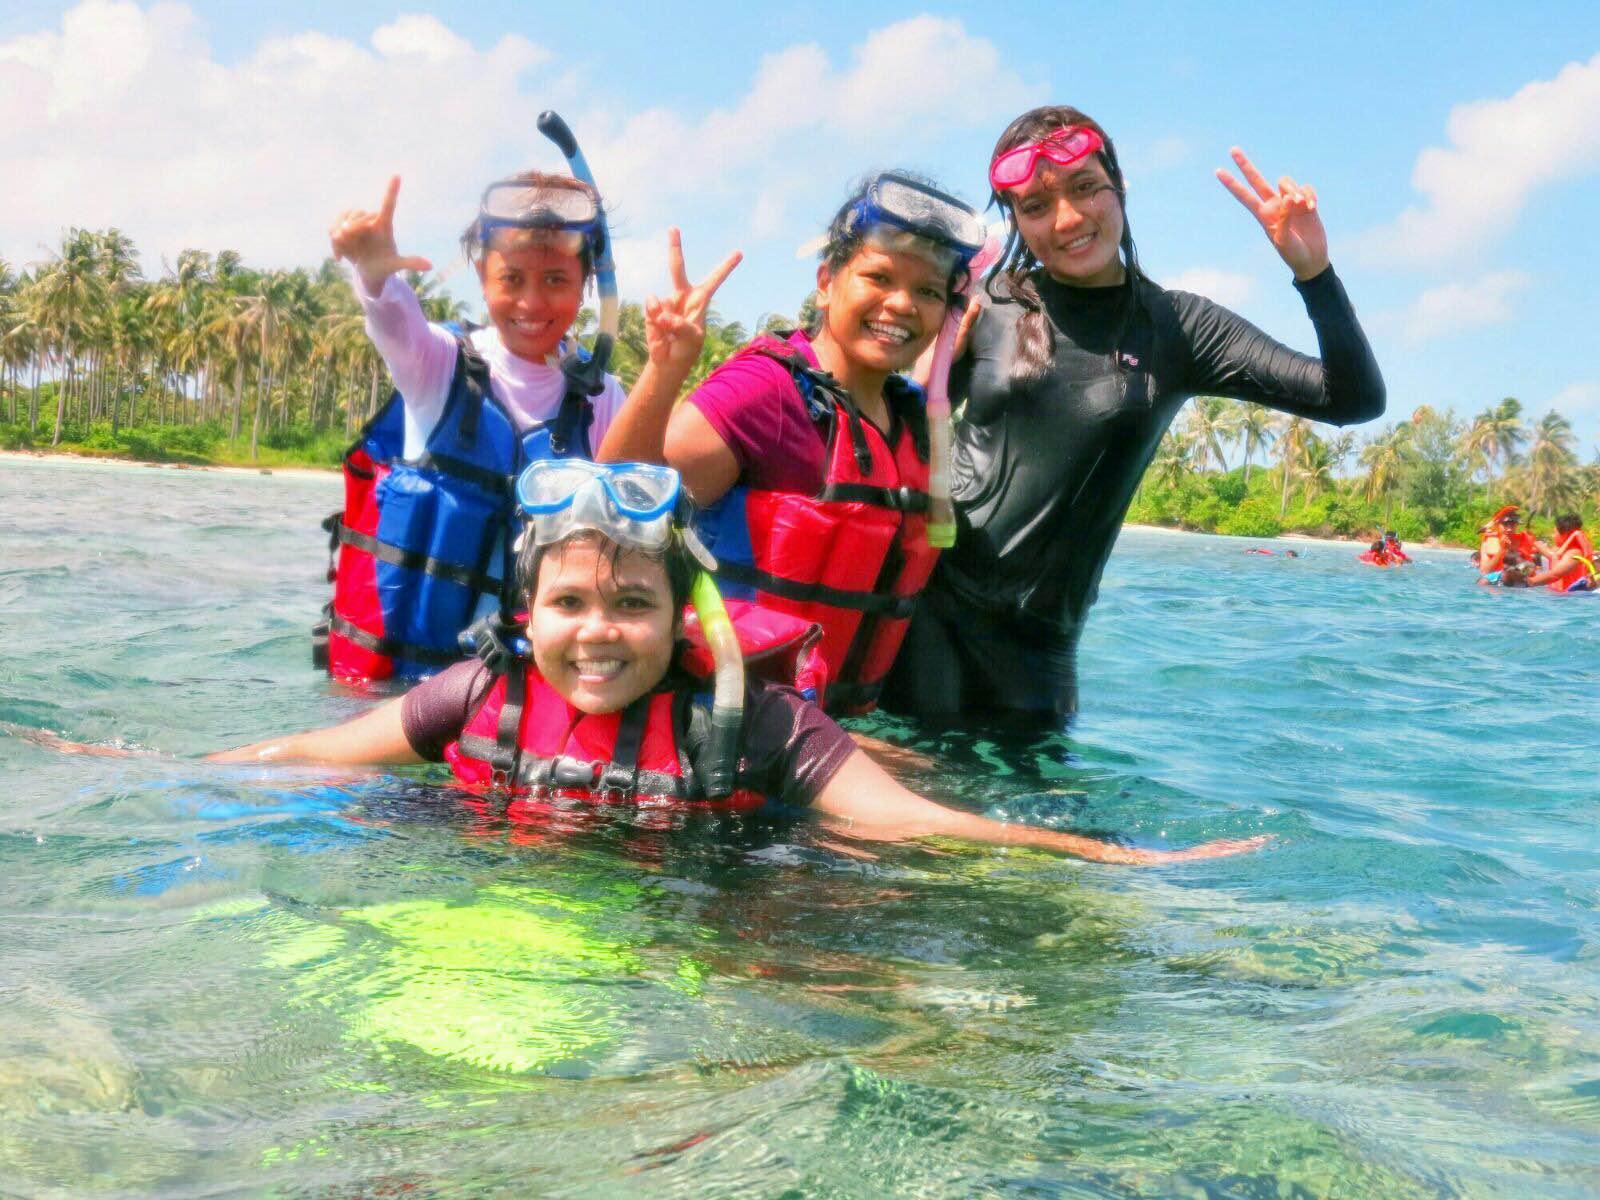 Terdampar di Karimun Jawa 5 hari, Rahma ganjal perut pakai jambu air!